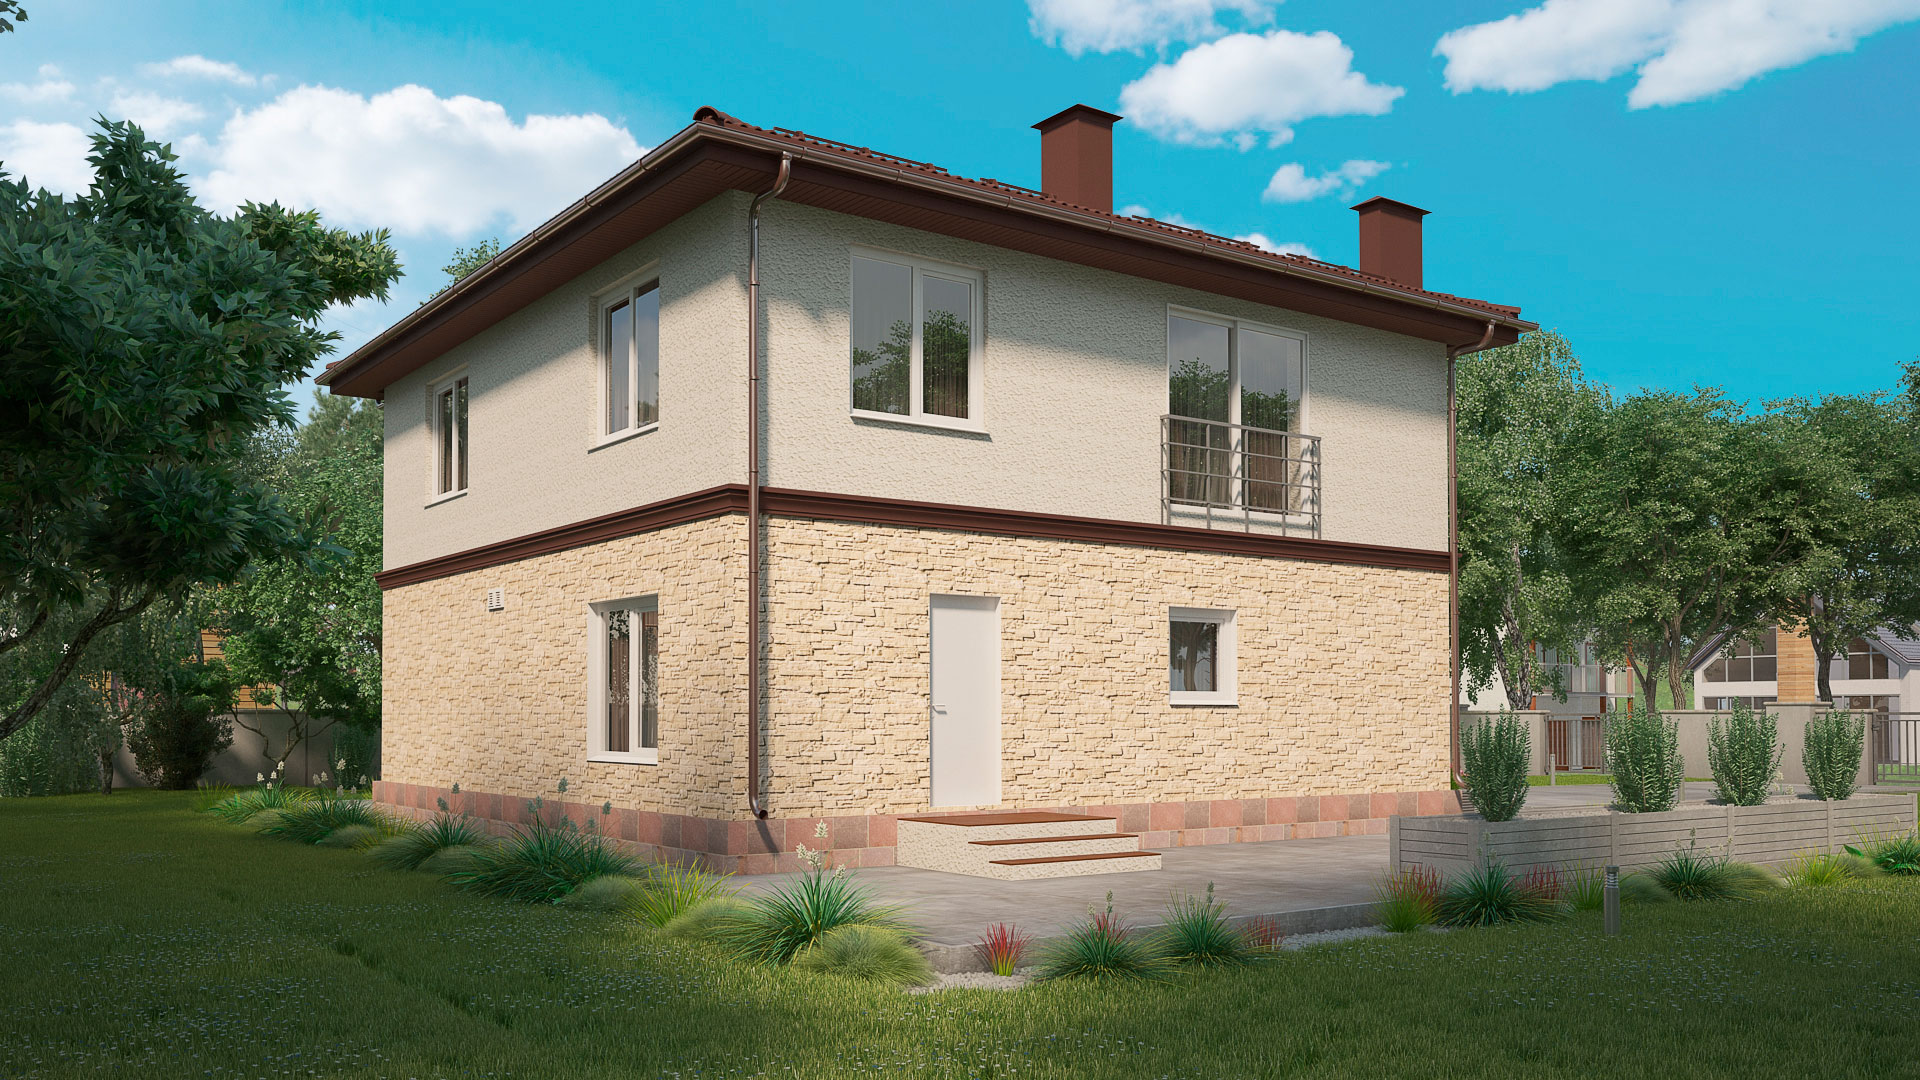 Задний фасад дома 10 на 10 двухэтажного, проект БЭНПАН МС-188.